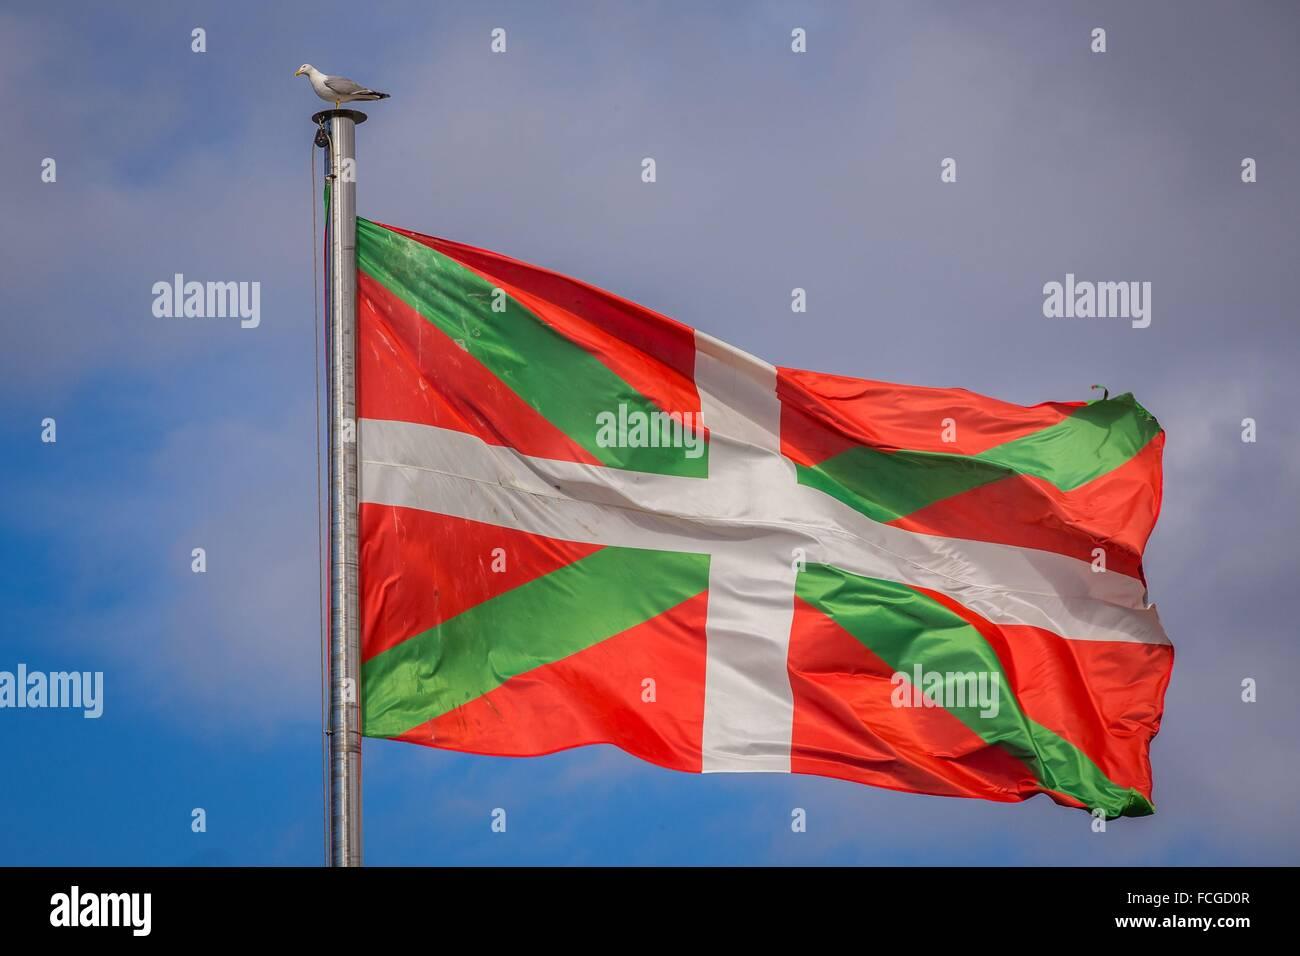 SAINT SEBASTIAN, DONOSTIA, 2016 EUROPEAN CAPITAL OF CULTURE, BASQUE COUNTRY, SPAIN - Stock Image